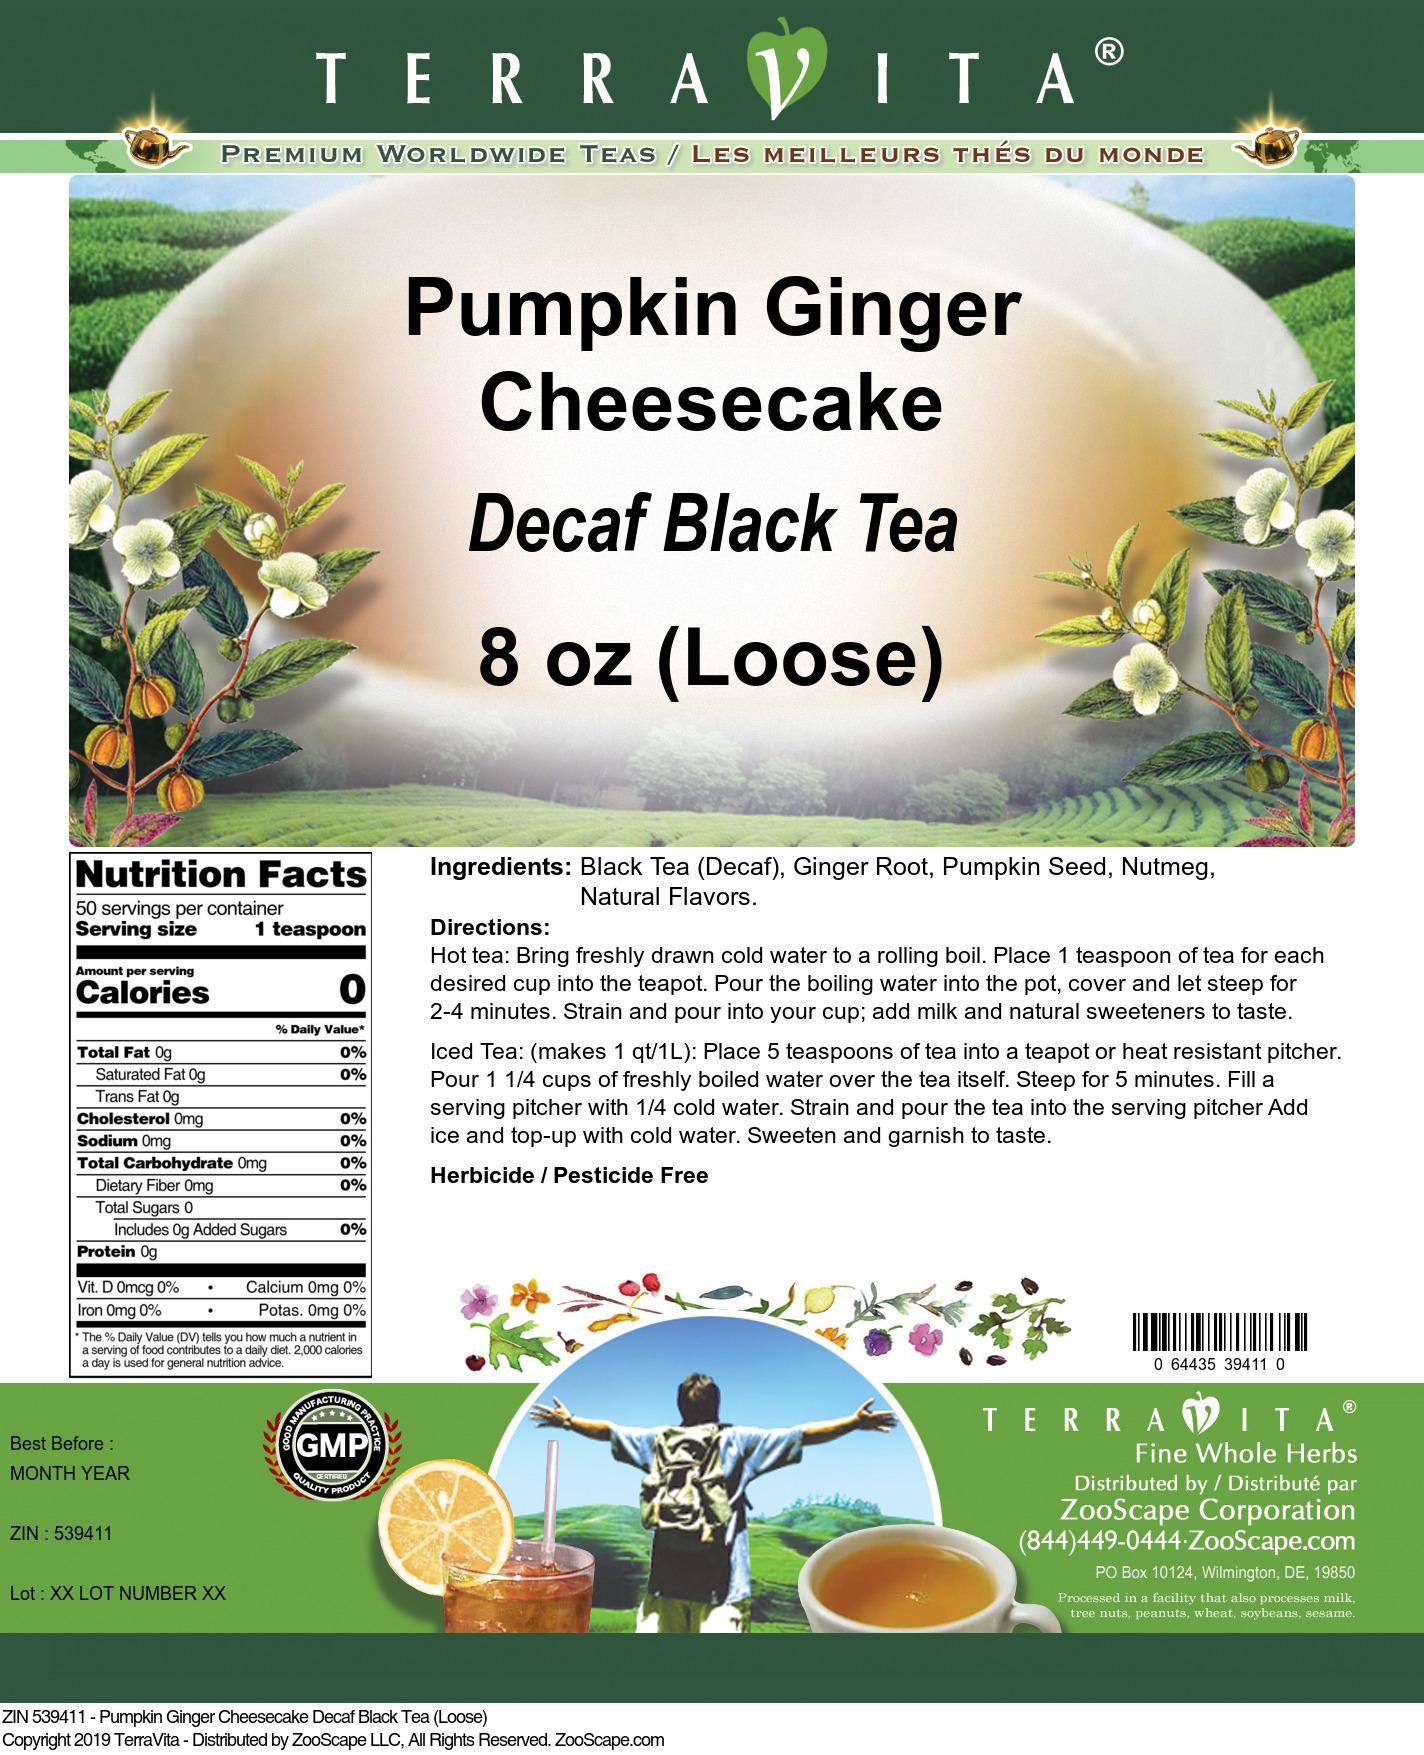 Pumpkin Ginger Cheesecake Decaf Black Tea (Loose)